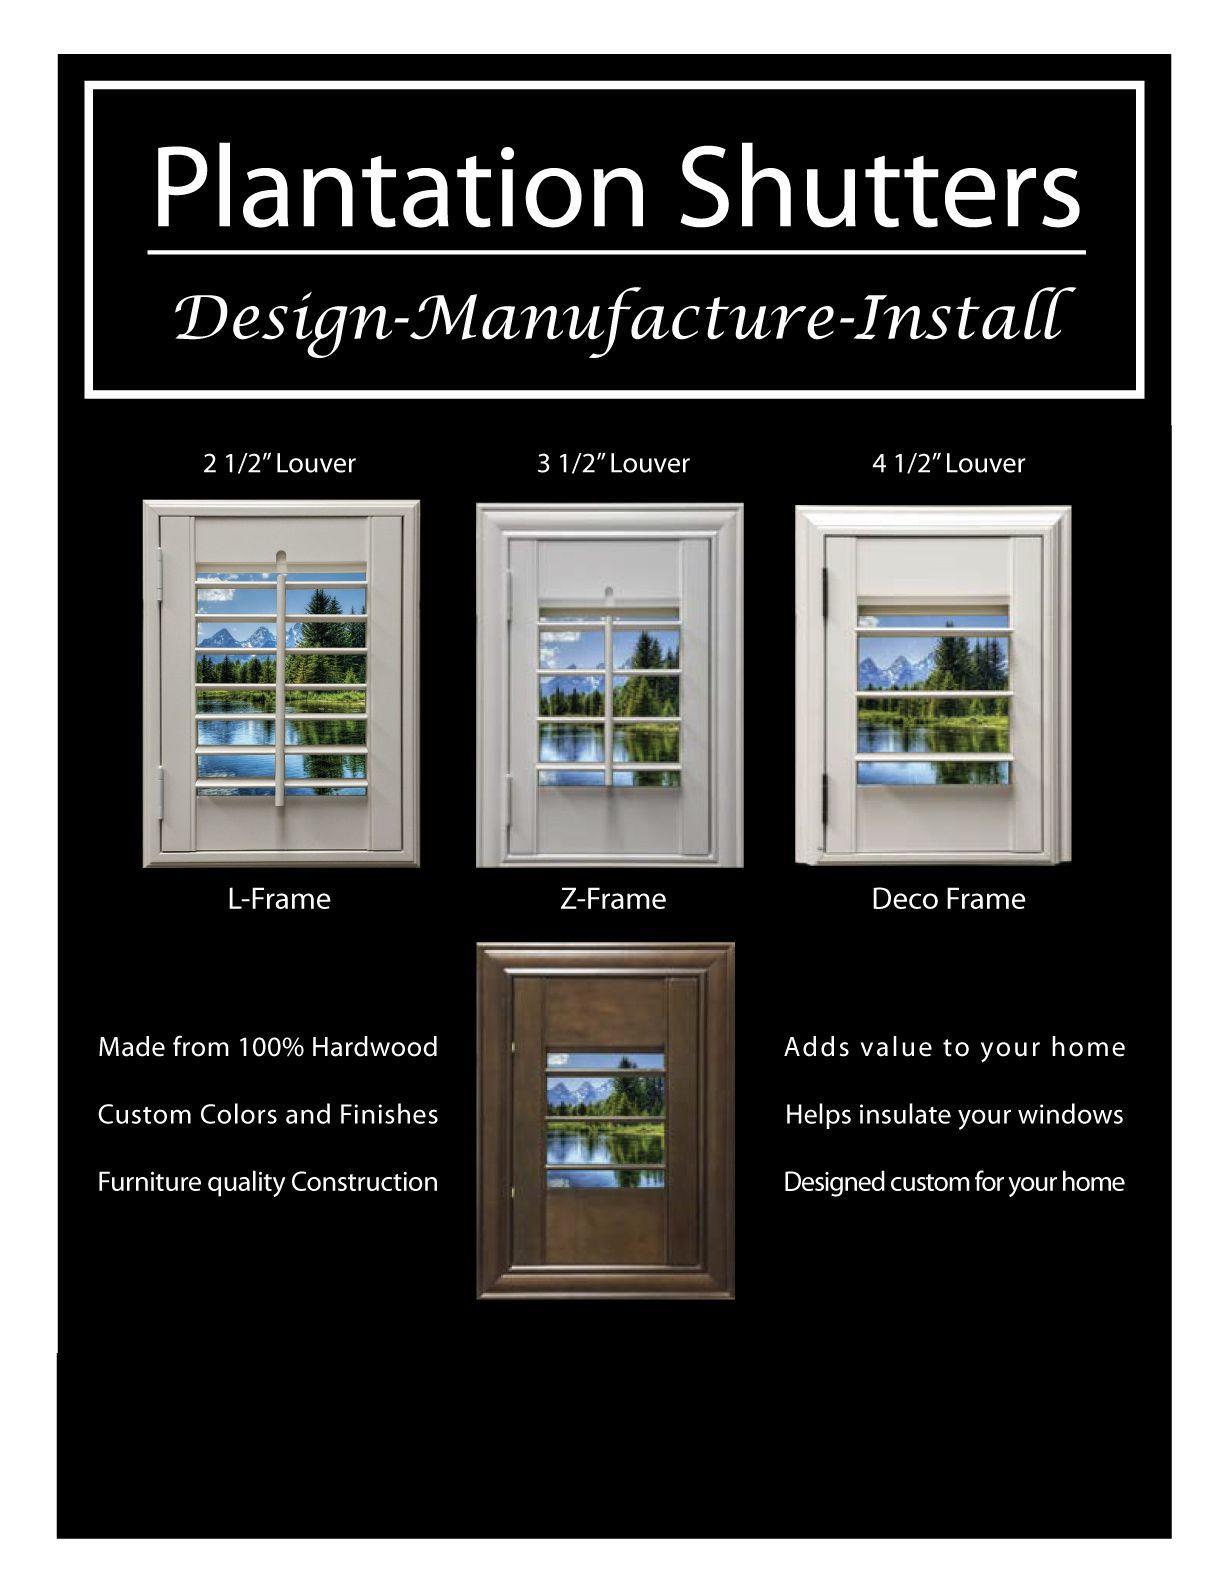 Shutters For Sale Shutter Installation Plantation Shutters